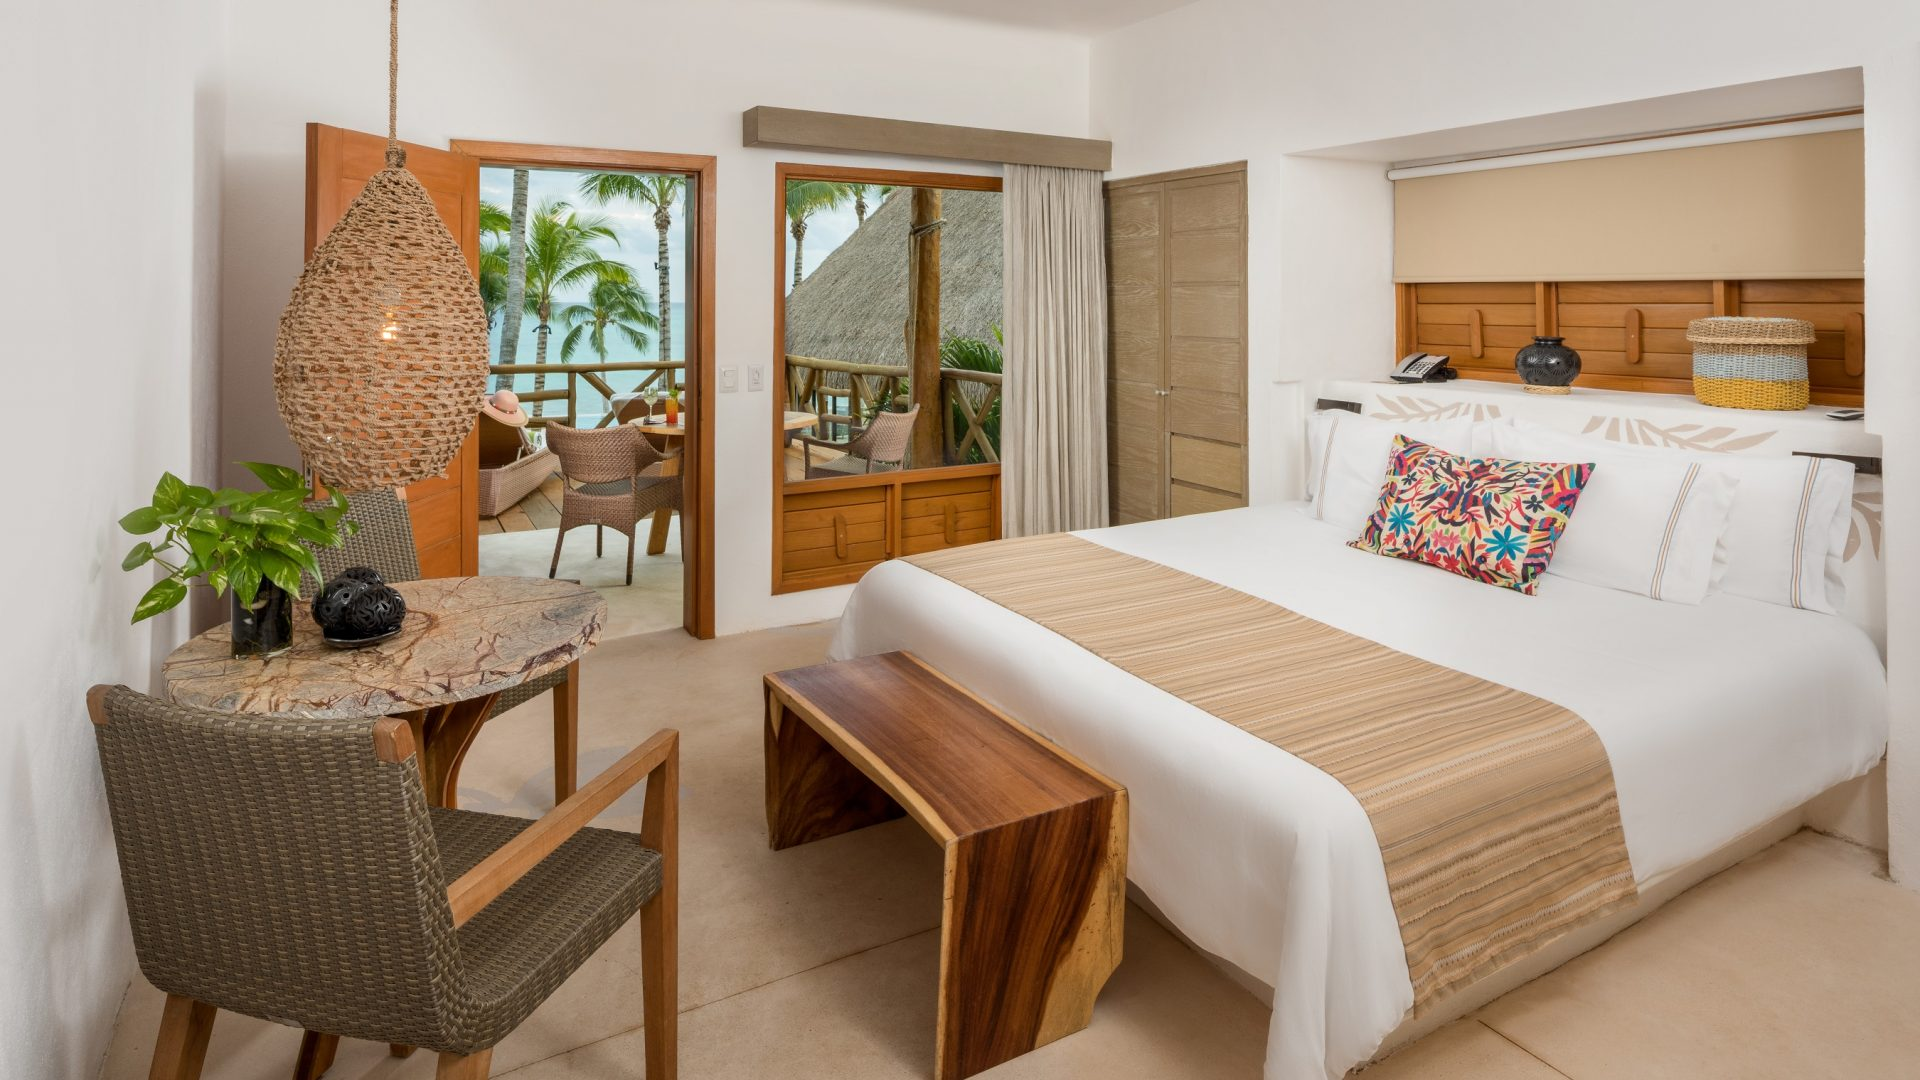 Hotel Rooms in Playa Del Carmen